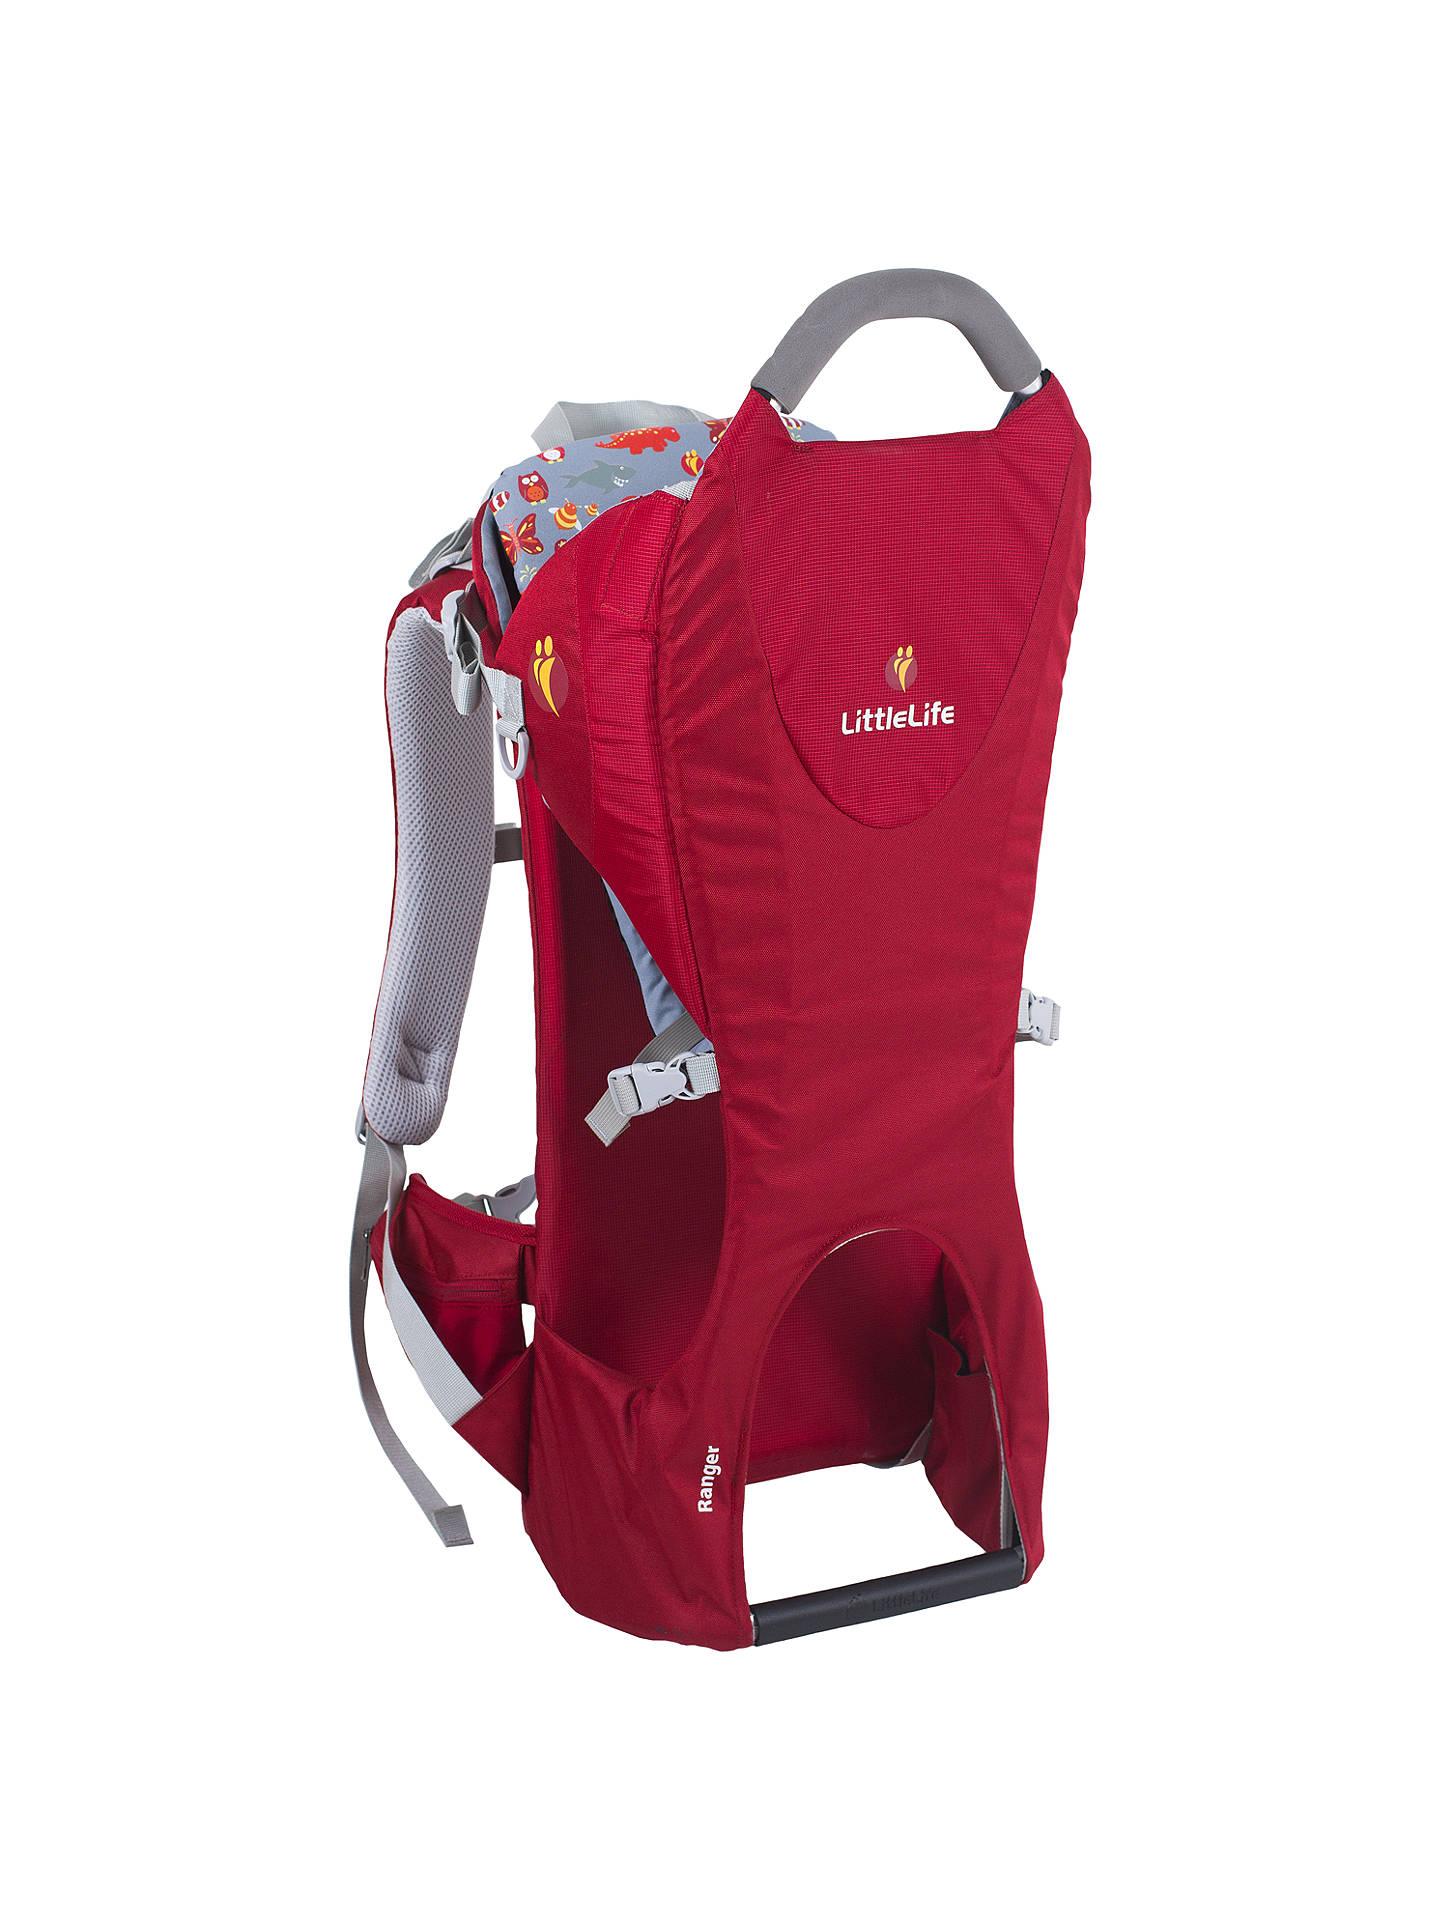 fb23cc4000b Buy LittleLife Ranger S2 Child Back Carrier Online at johnlewis.com ...